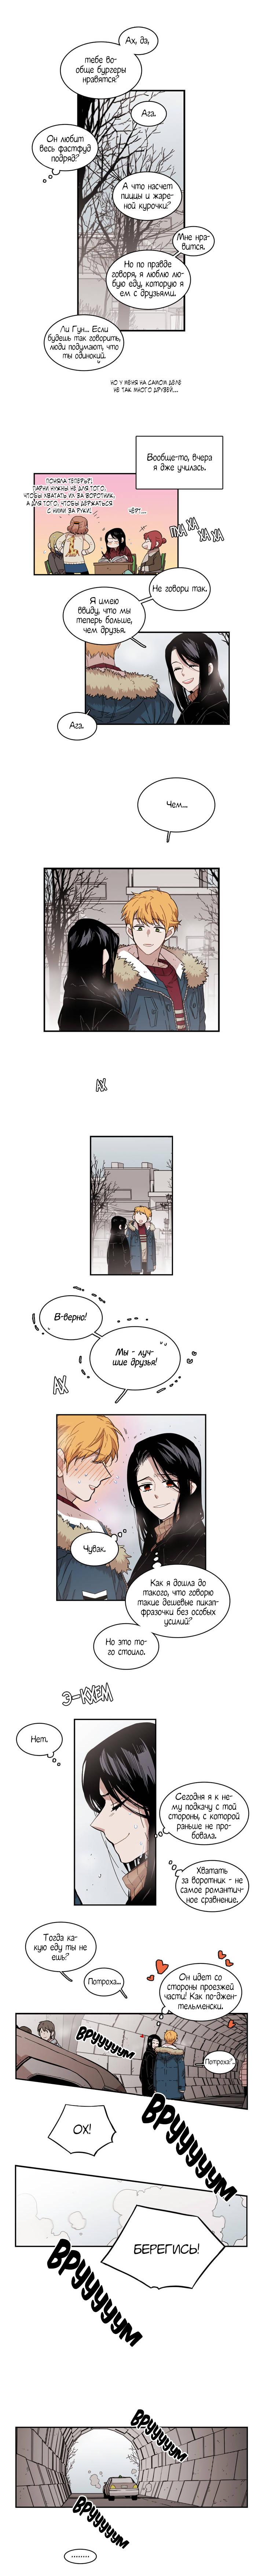 https://r1.ninemanga.com/comics/pic2/24/19800/1108007/1540395744441.jpg Page 3